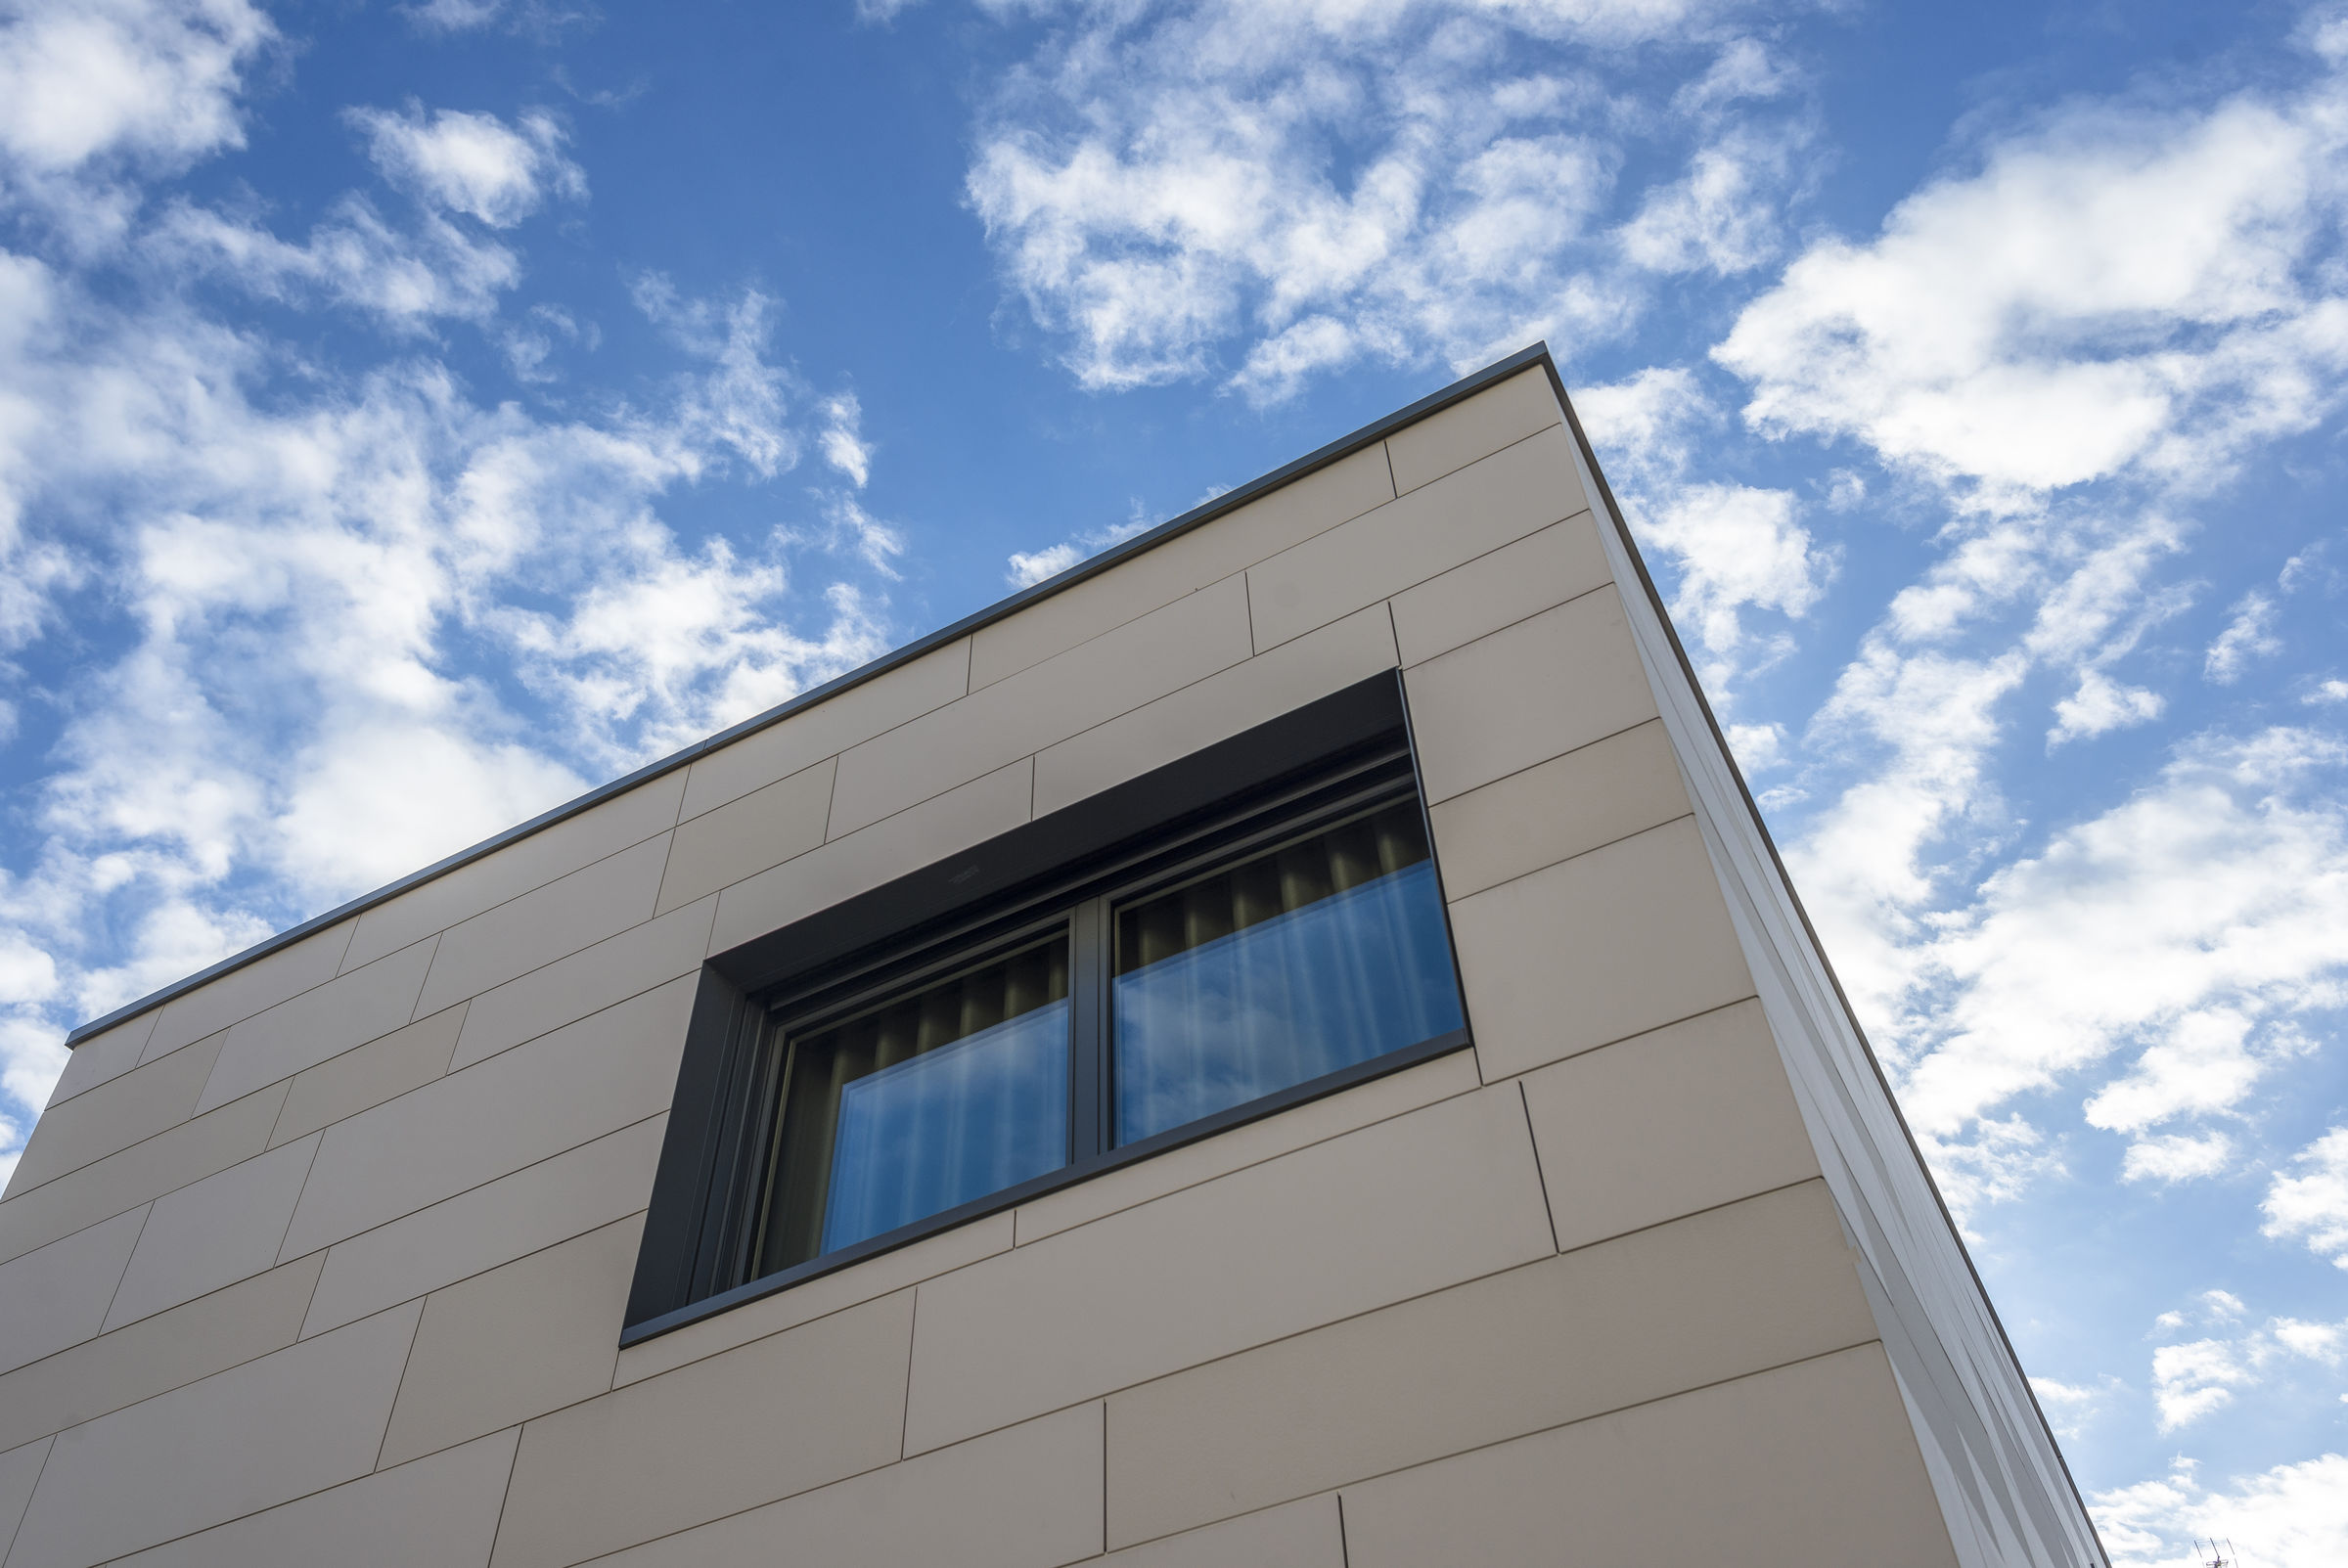 Lapitec® ventilated façades